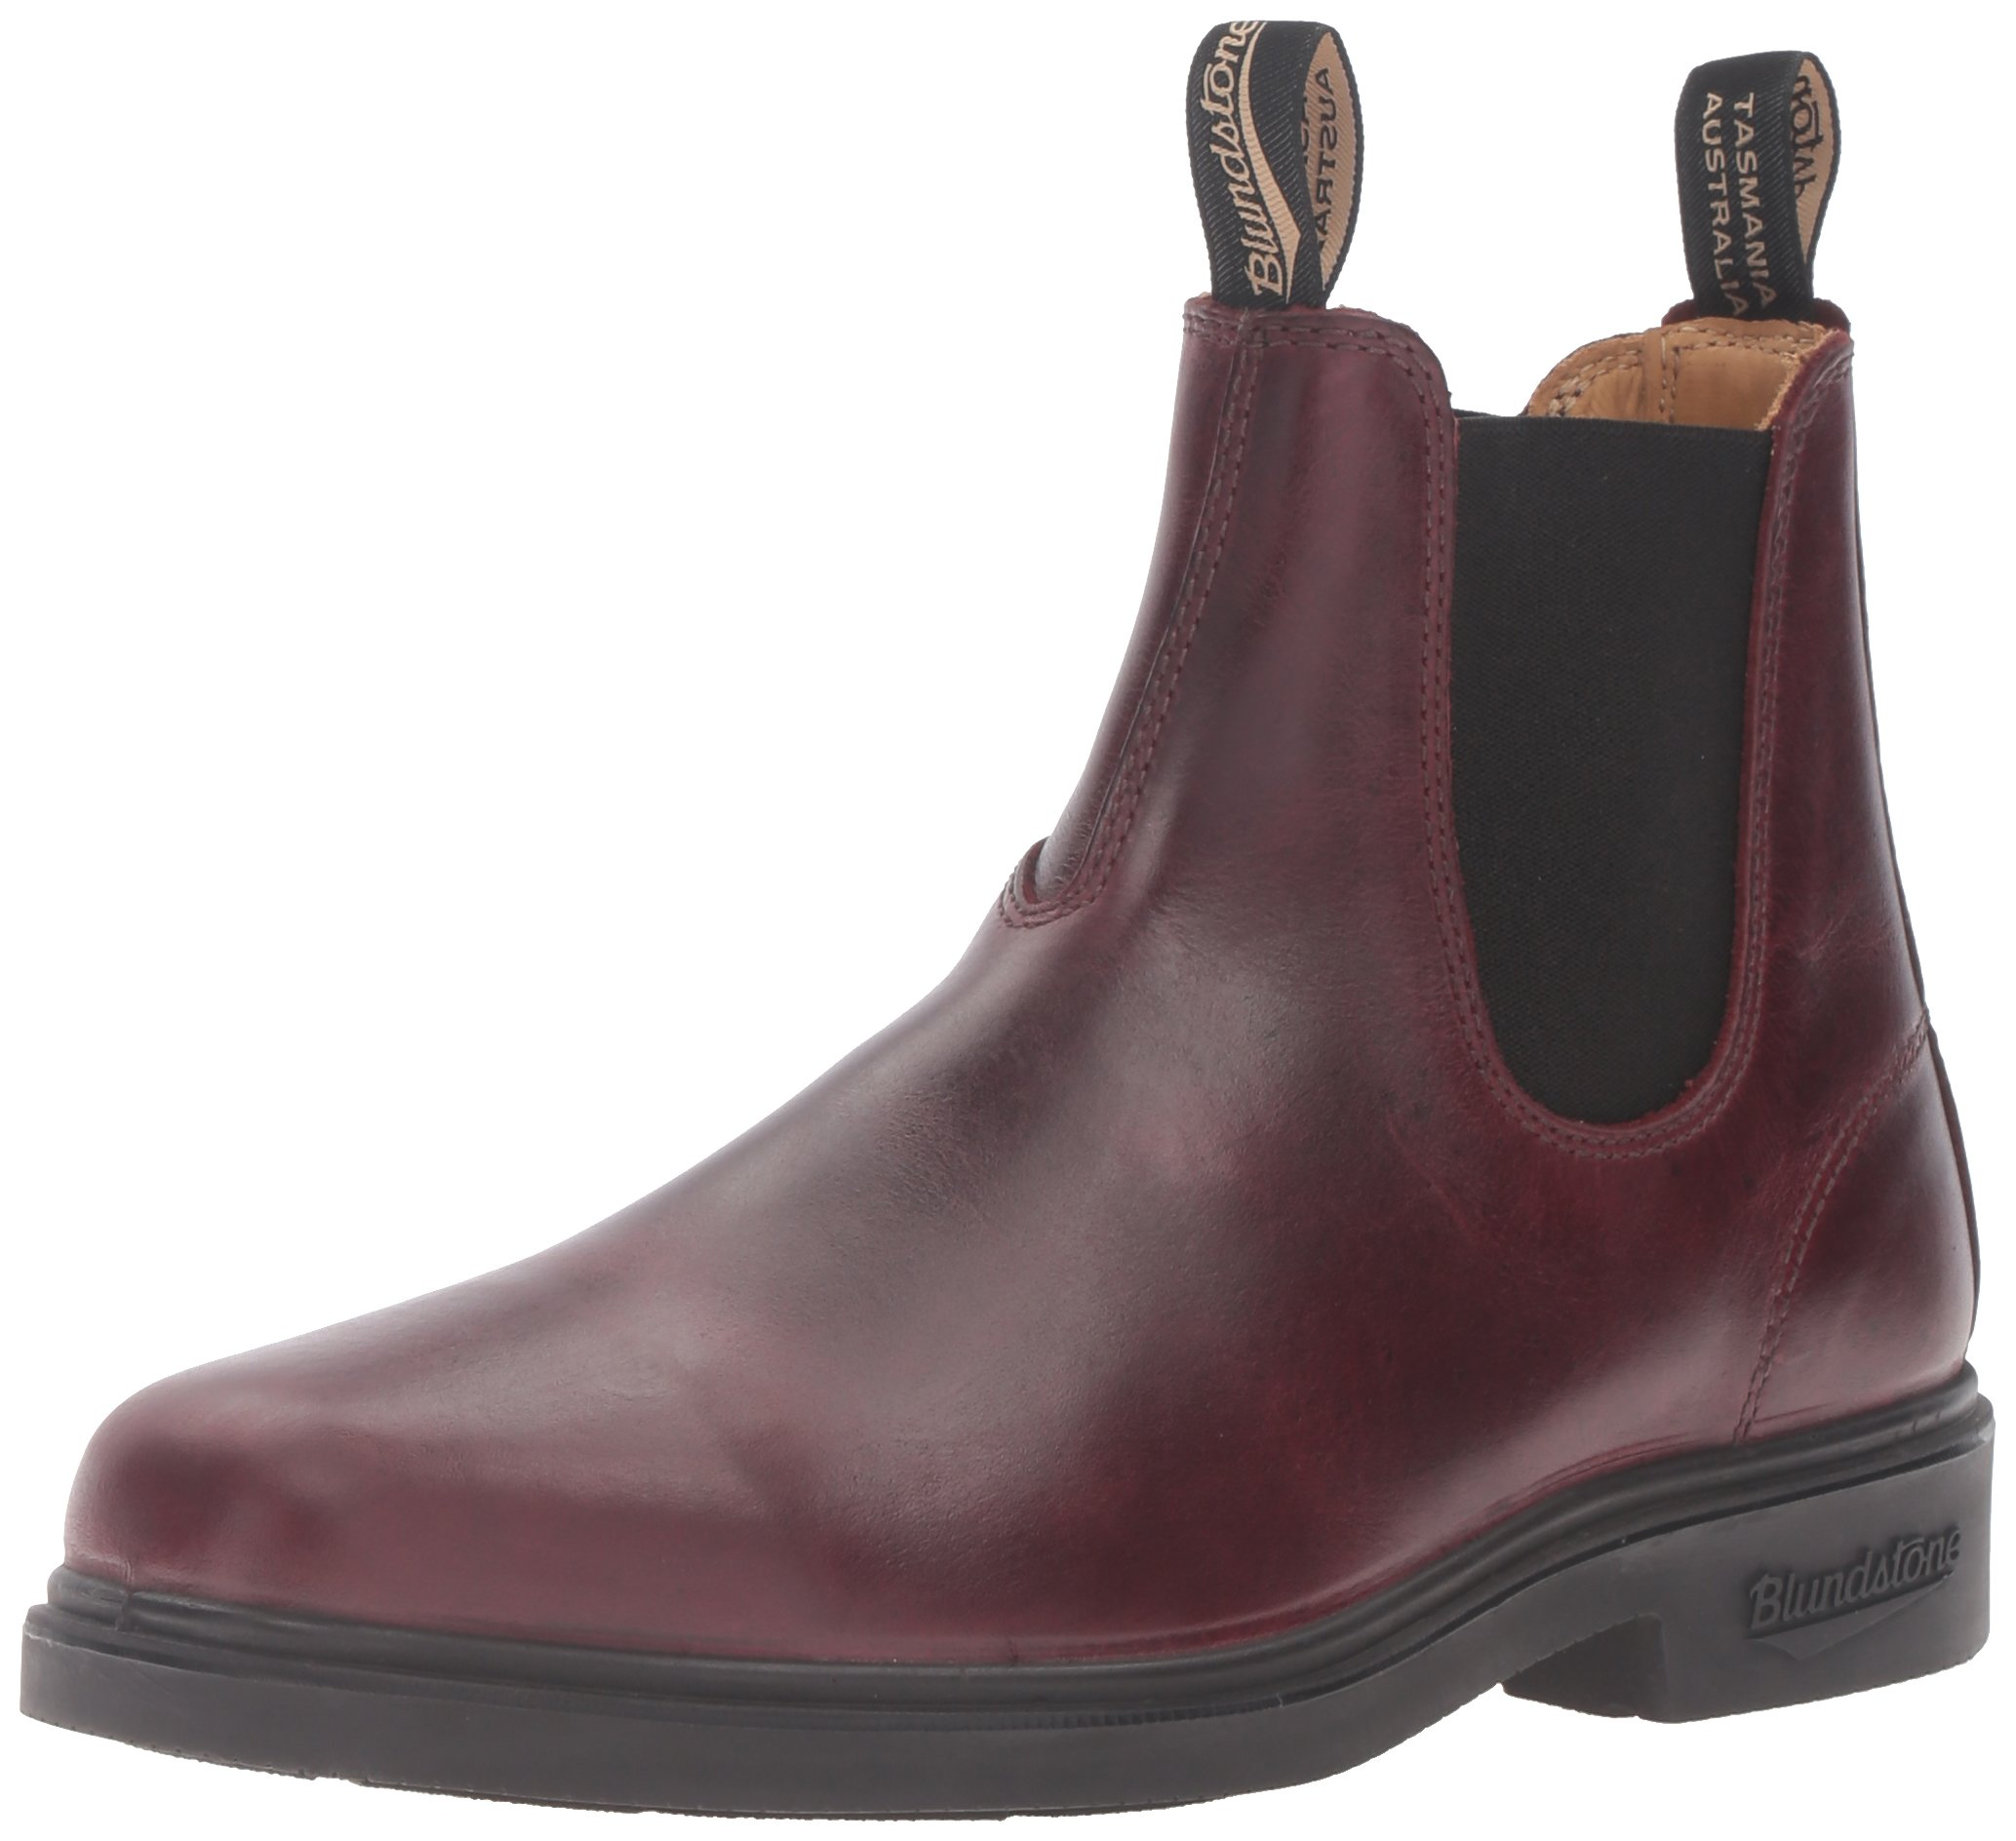 Blundstone Women's 1309 Chelsea Boot, Redwood, 4 UK/7 M US